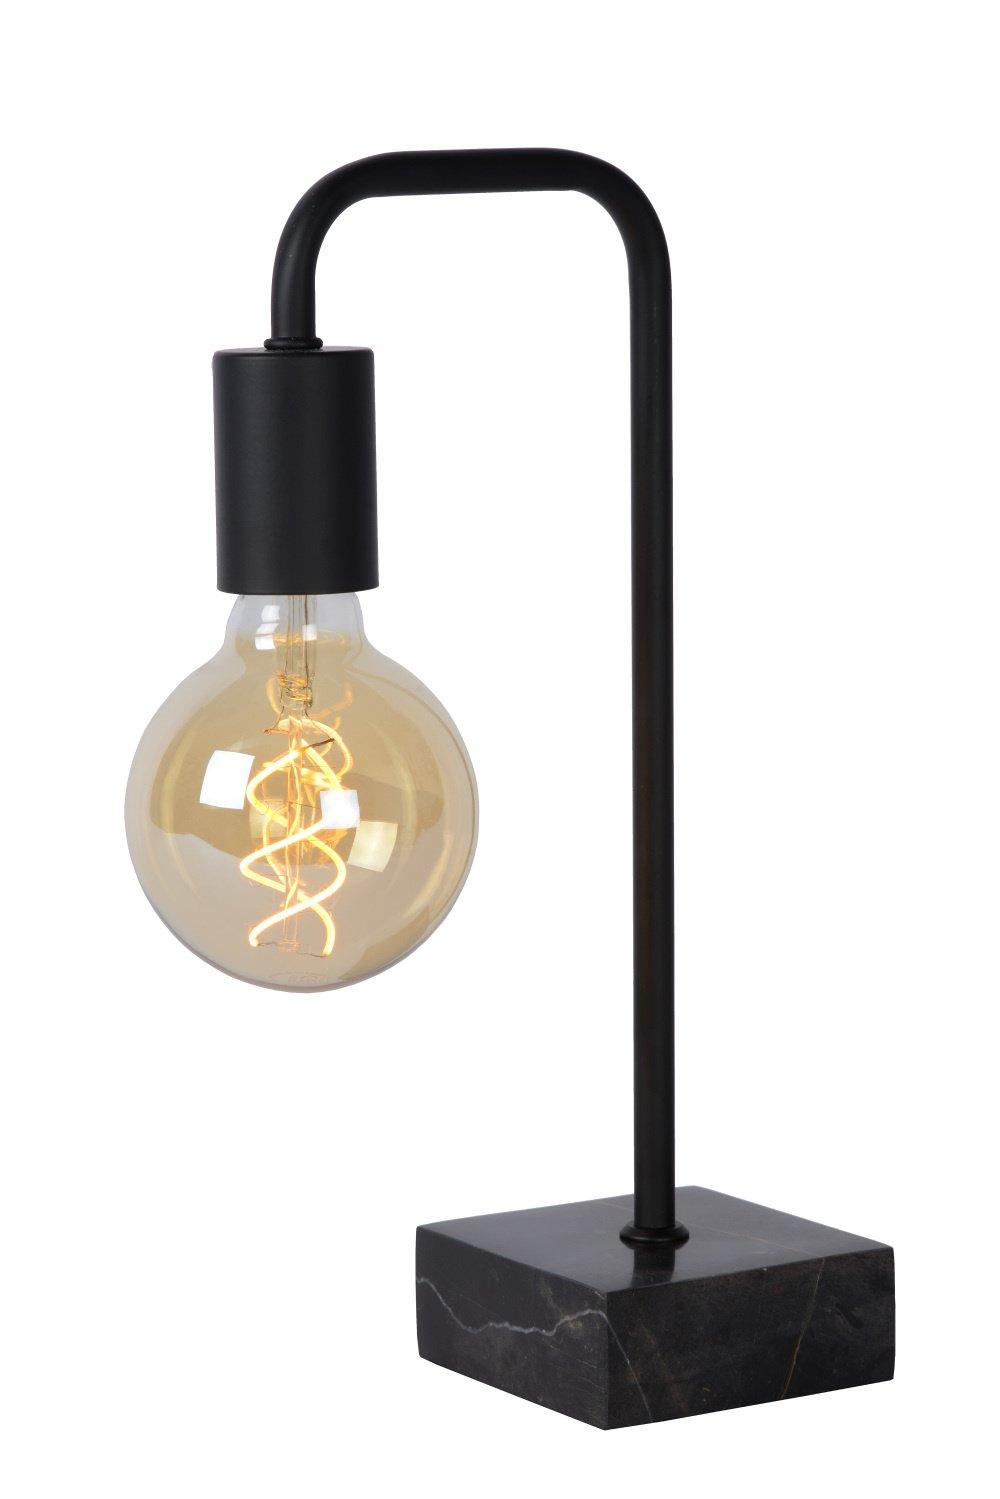 Lucide LORIN Tafellamp-Zwart-1xE27-40W-Staal